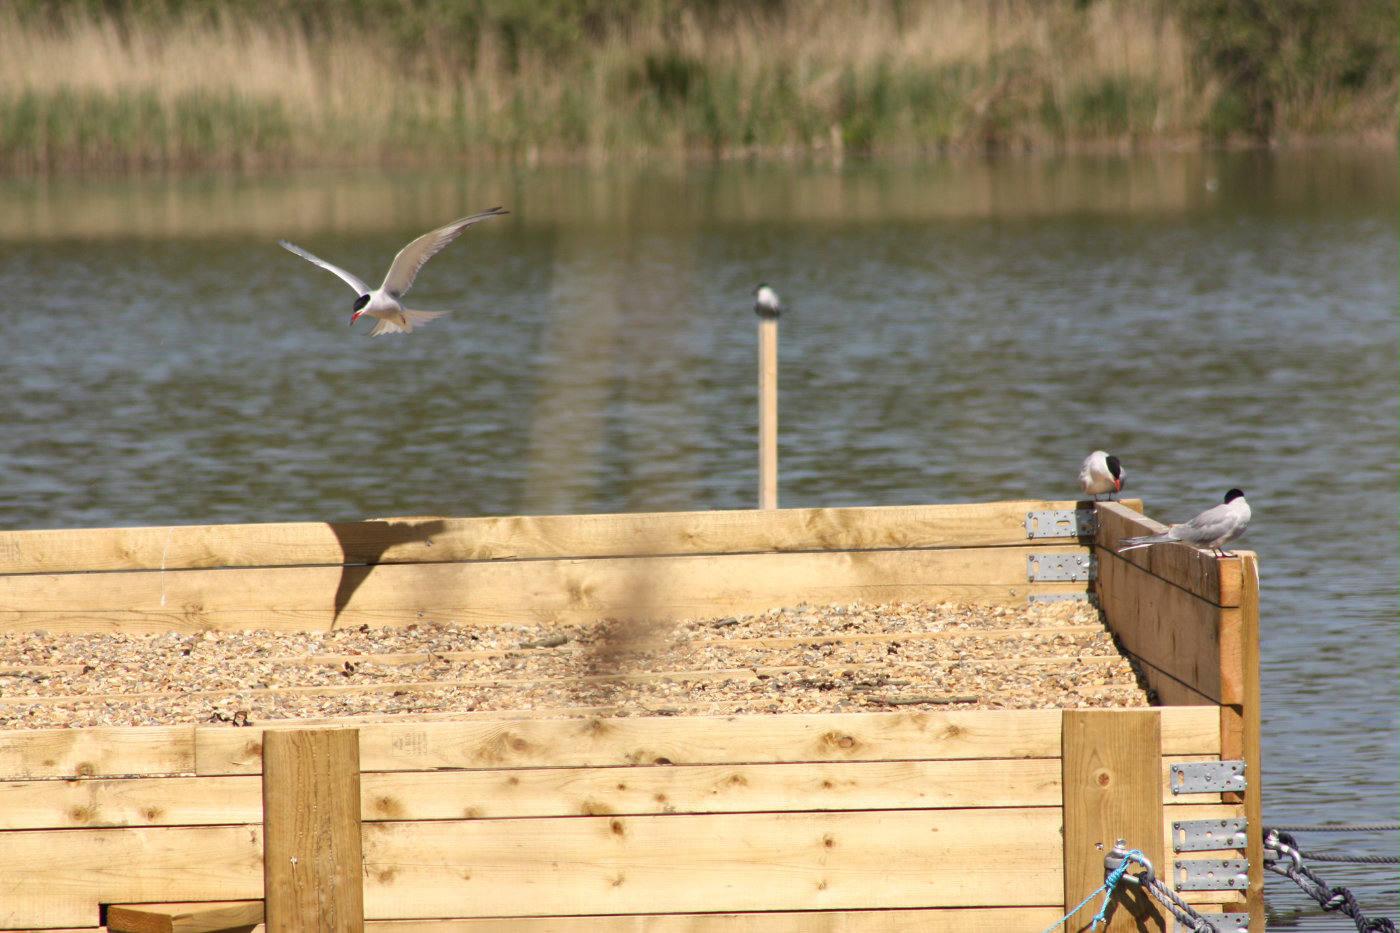 Common Terns on platform at Hoveton Great Broad